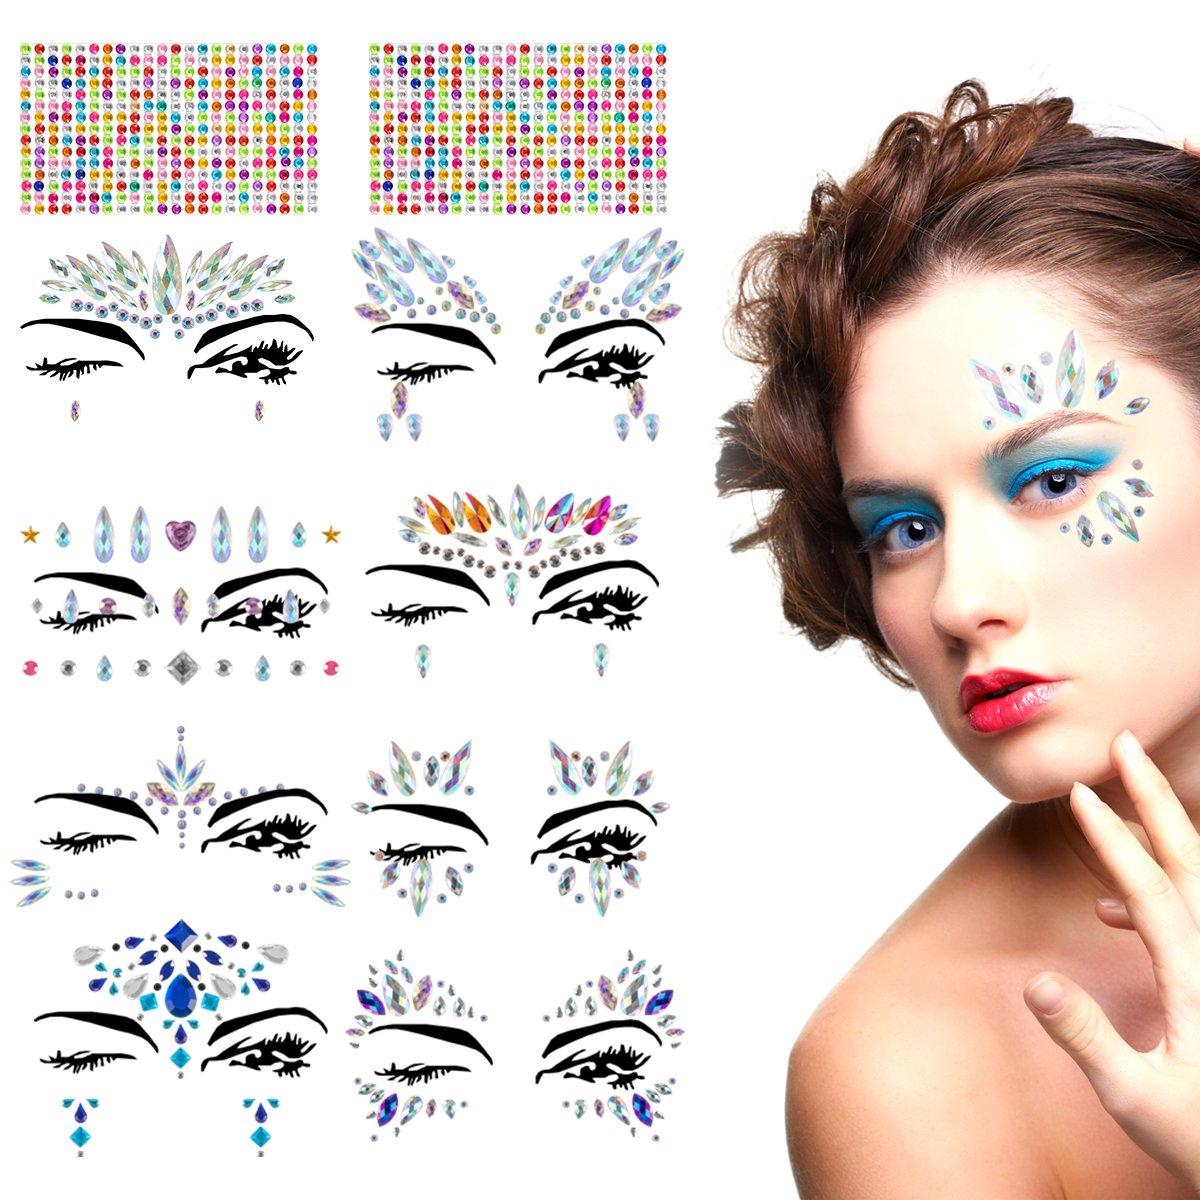 Madholly 10 sets Rhinestone Face Gems, self-adhesive Face Jewel Tattoo Sticker, Rave Festival Jewels Bindi Crystal Face Sticker